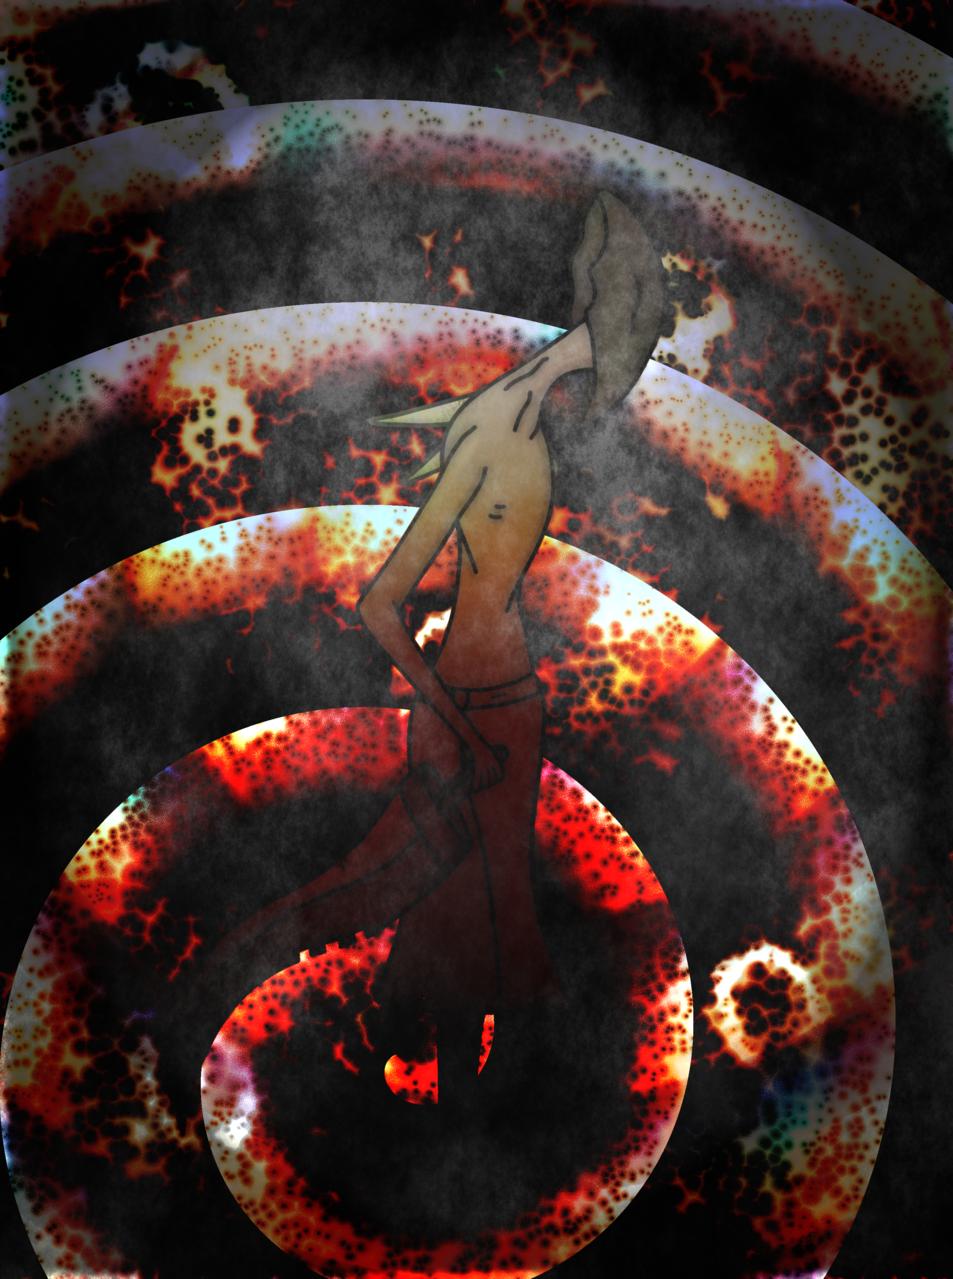 Undaunted Illust of CopperNeon August2020_Contest:Horror anime Creepypasta demon blood black dark illustration creature monster red